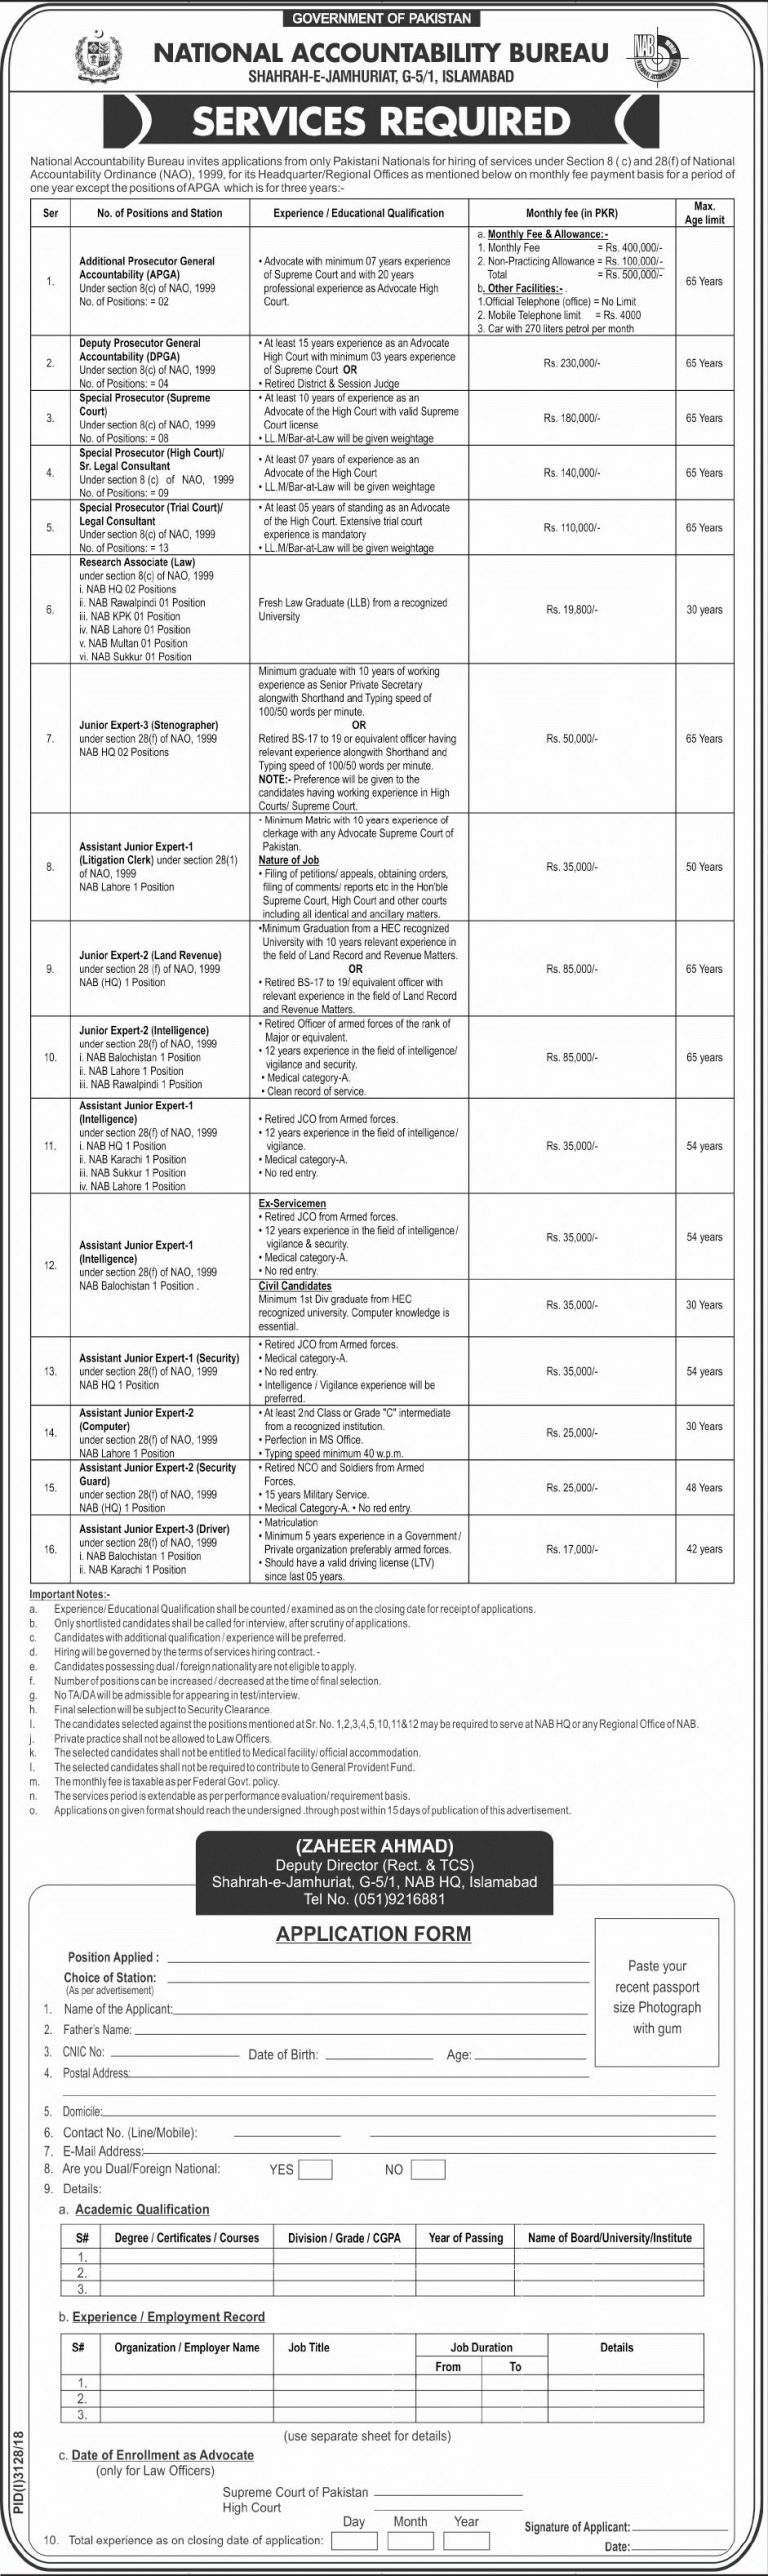 NAB Jobs 2019 National Accountability Bureau Islamabad | www.nab.gov.pk